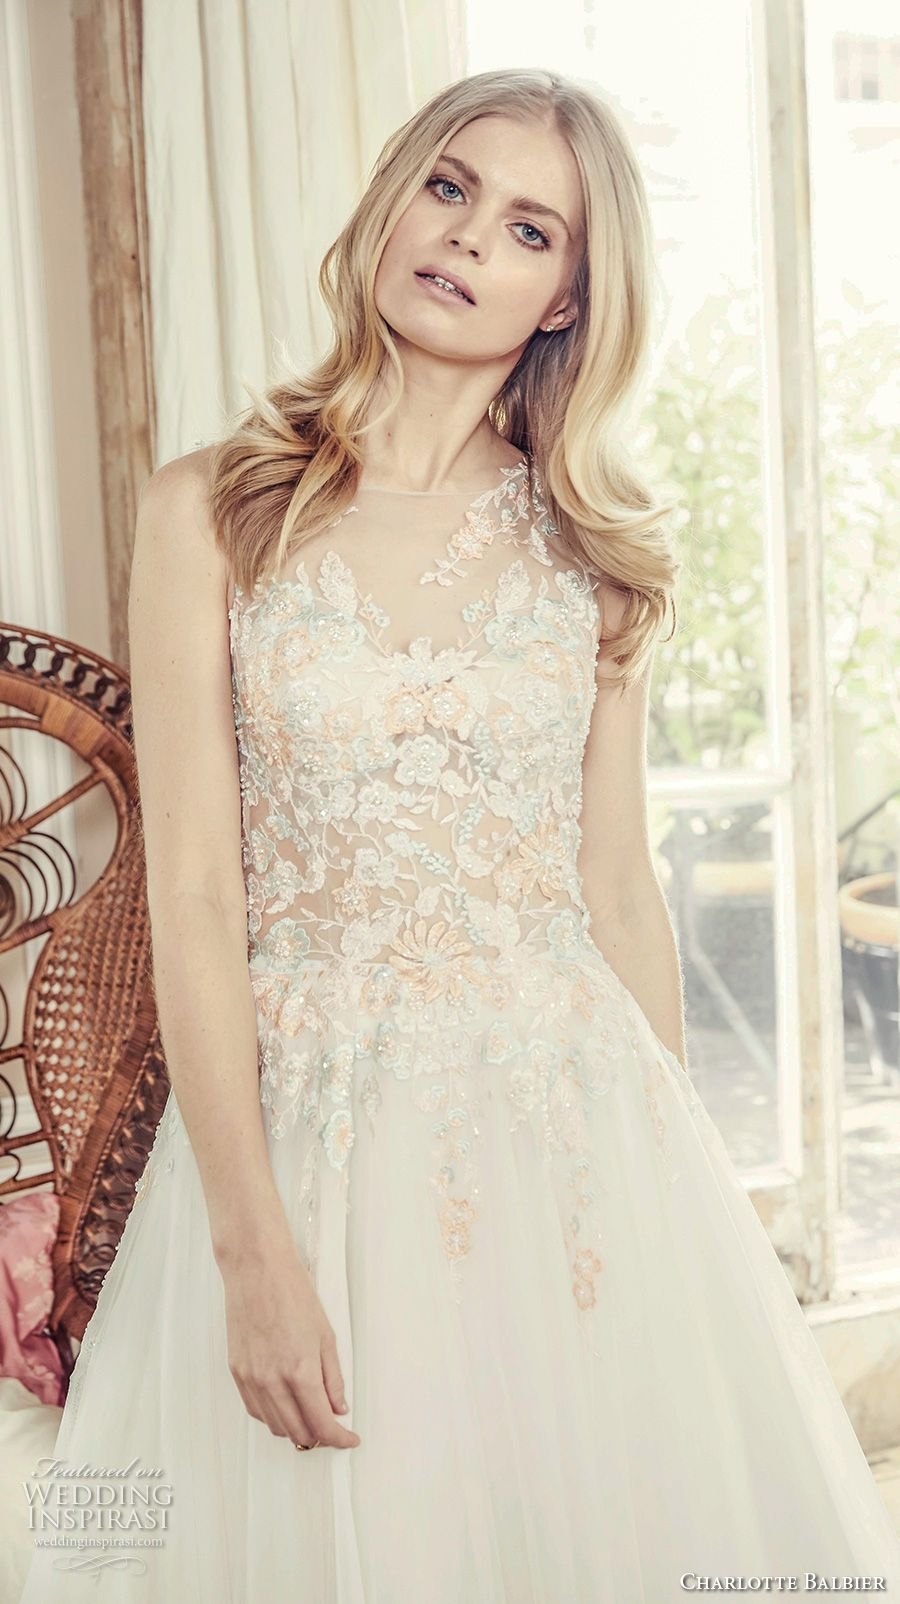 Charlotte balbier wedding dresses u ucbohemian blushud bridal